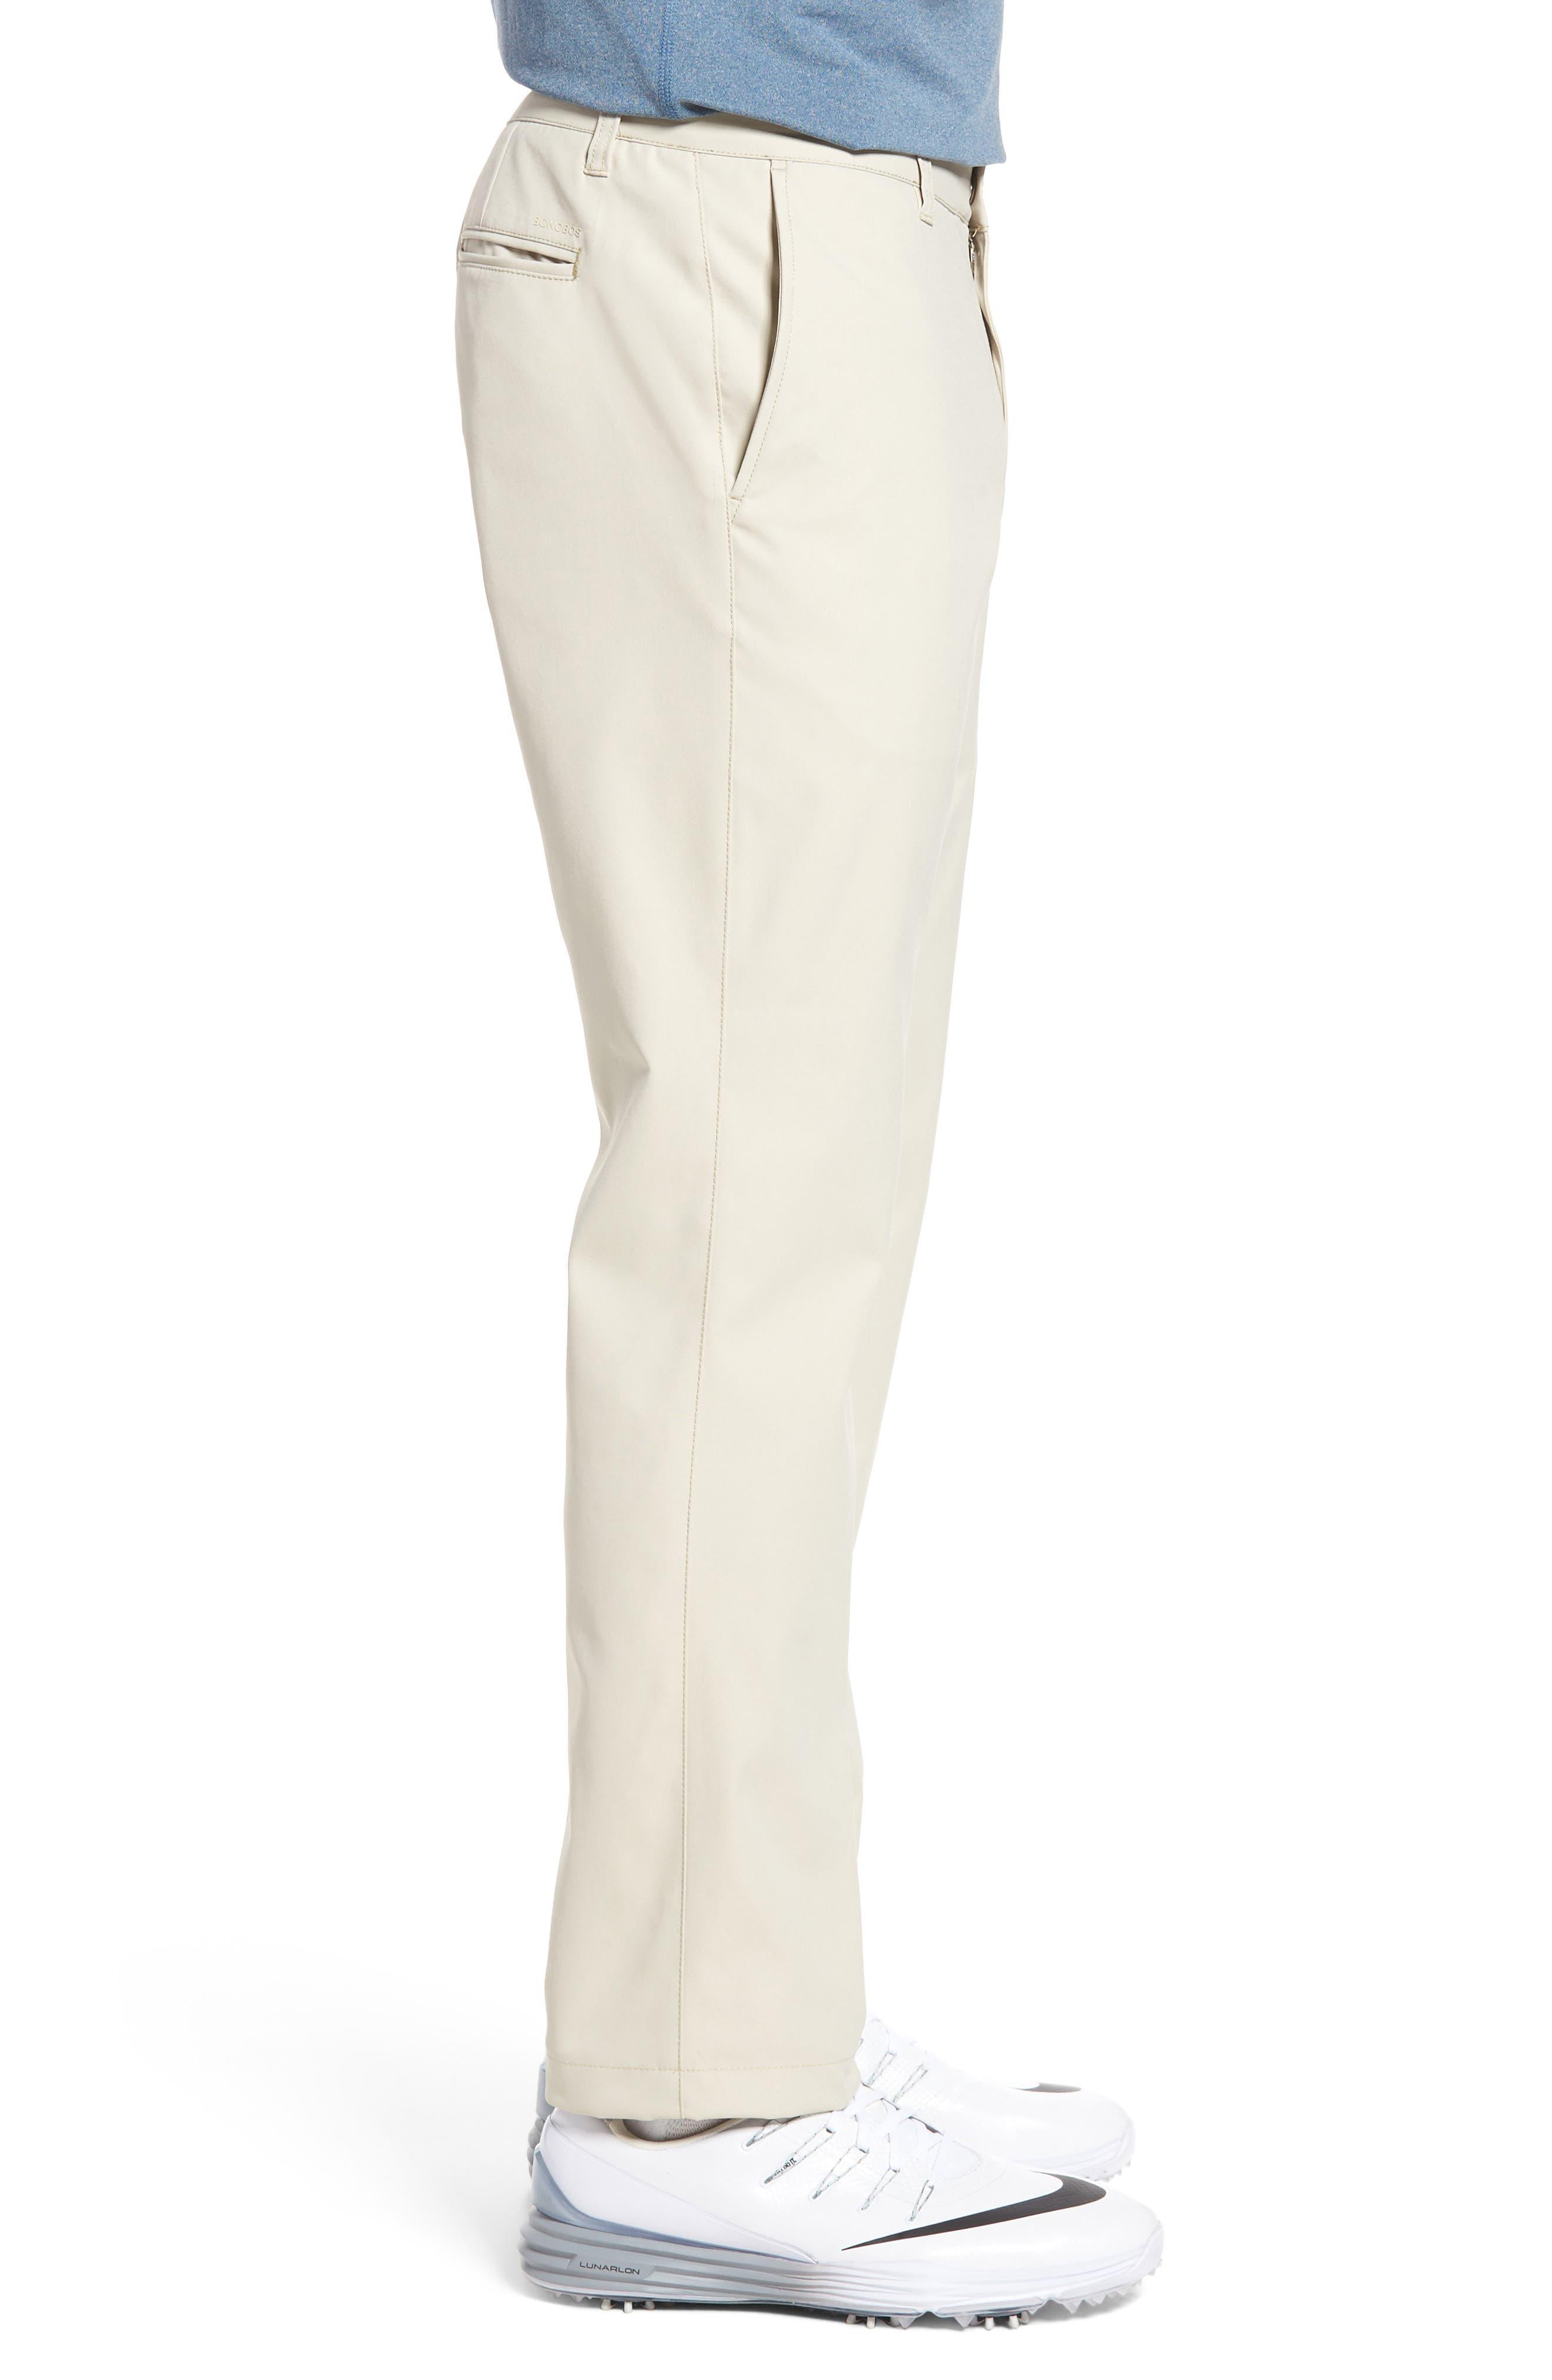 Highland Slim Fit Golf Pants,                             Alternate thumbnail 3, color,                             STONE